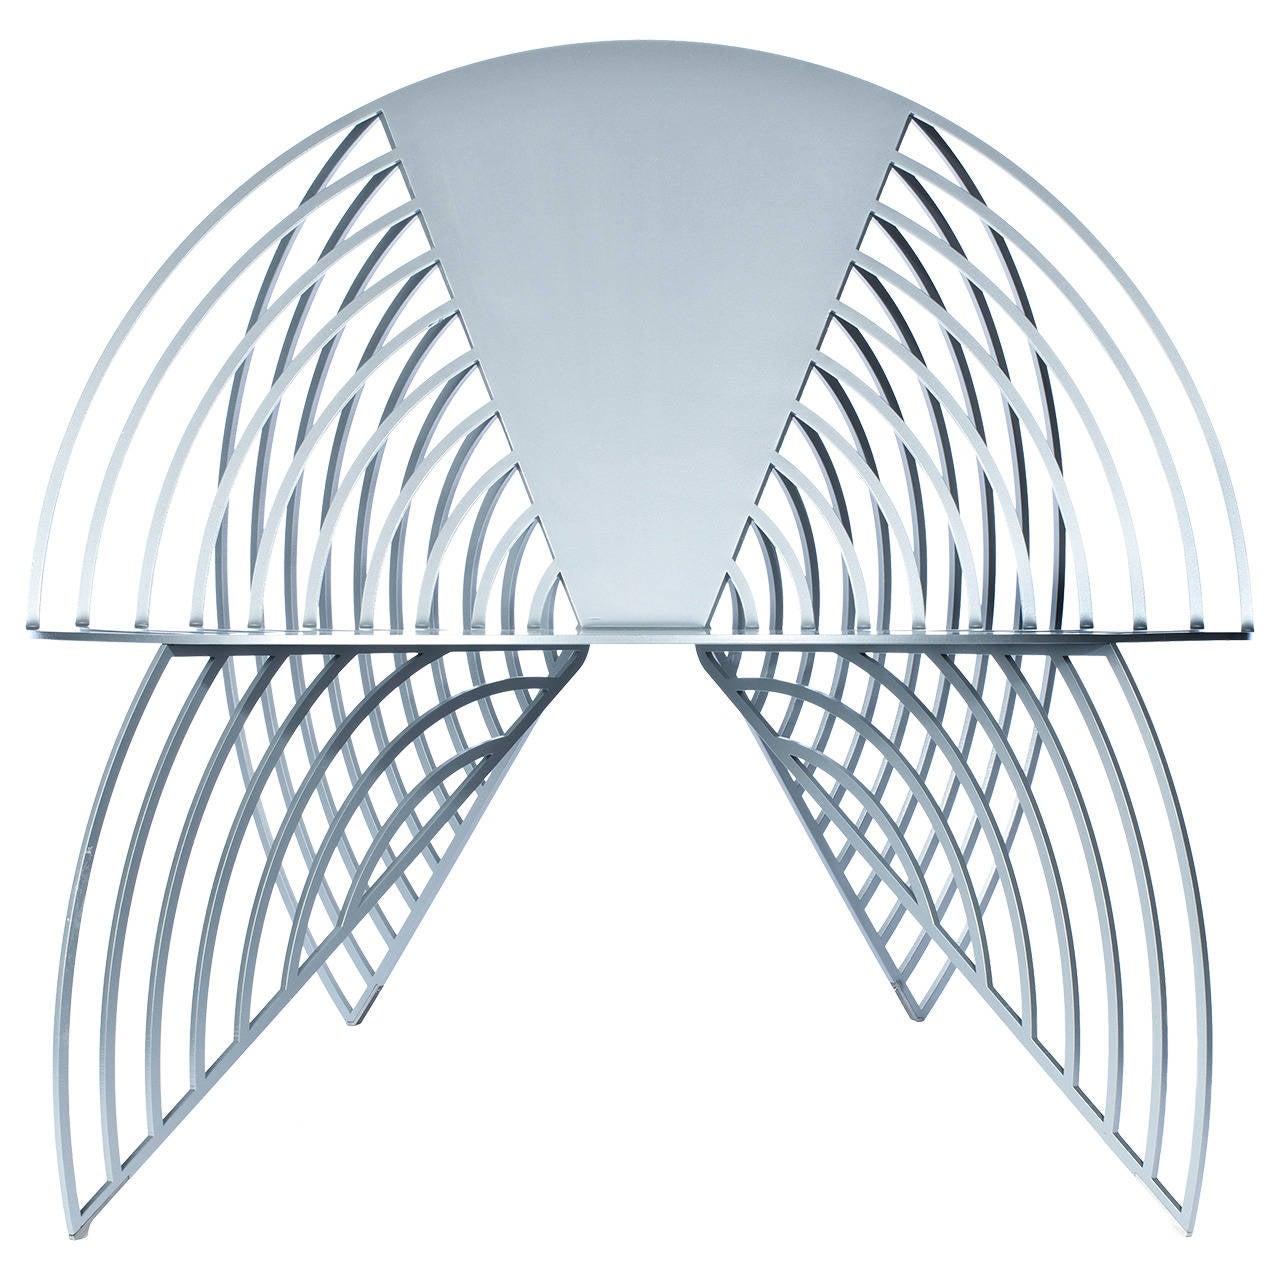 Wings of Steel Sculptural Chair in Silver, Designed by Laurie Beckerman in 2012